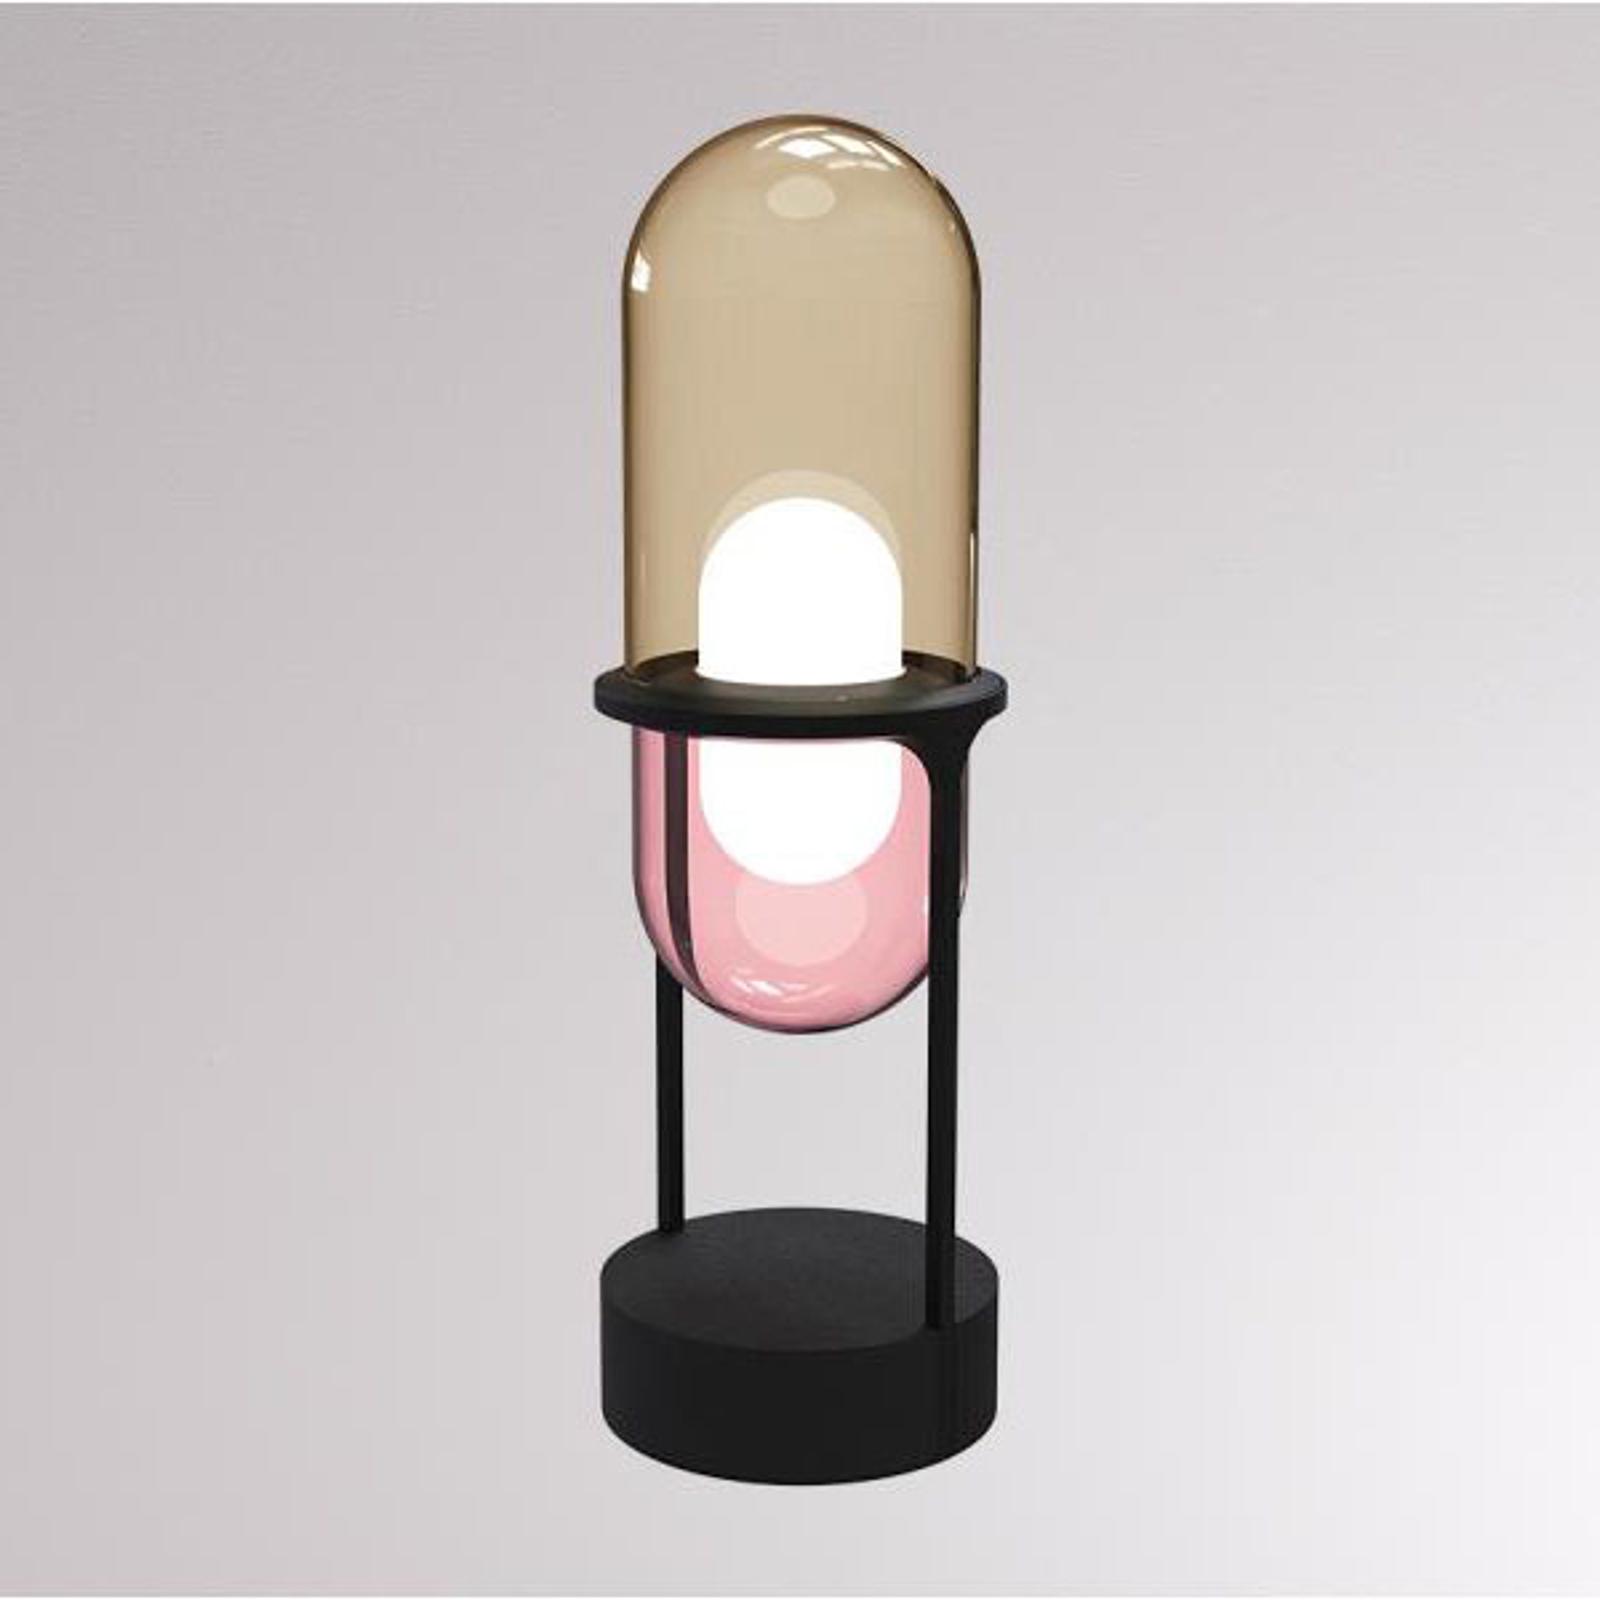 LOUM Pille LED tafellamp champagne/roze